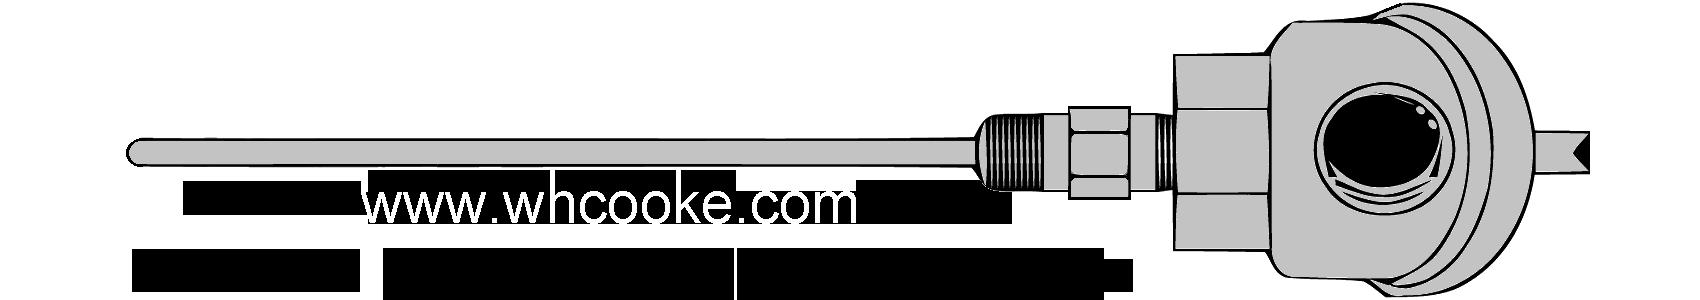 cooke_logo_redesign_white